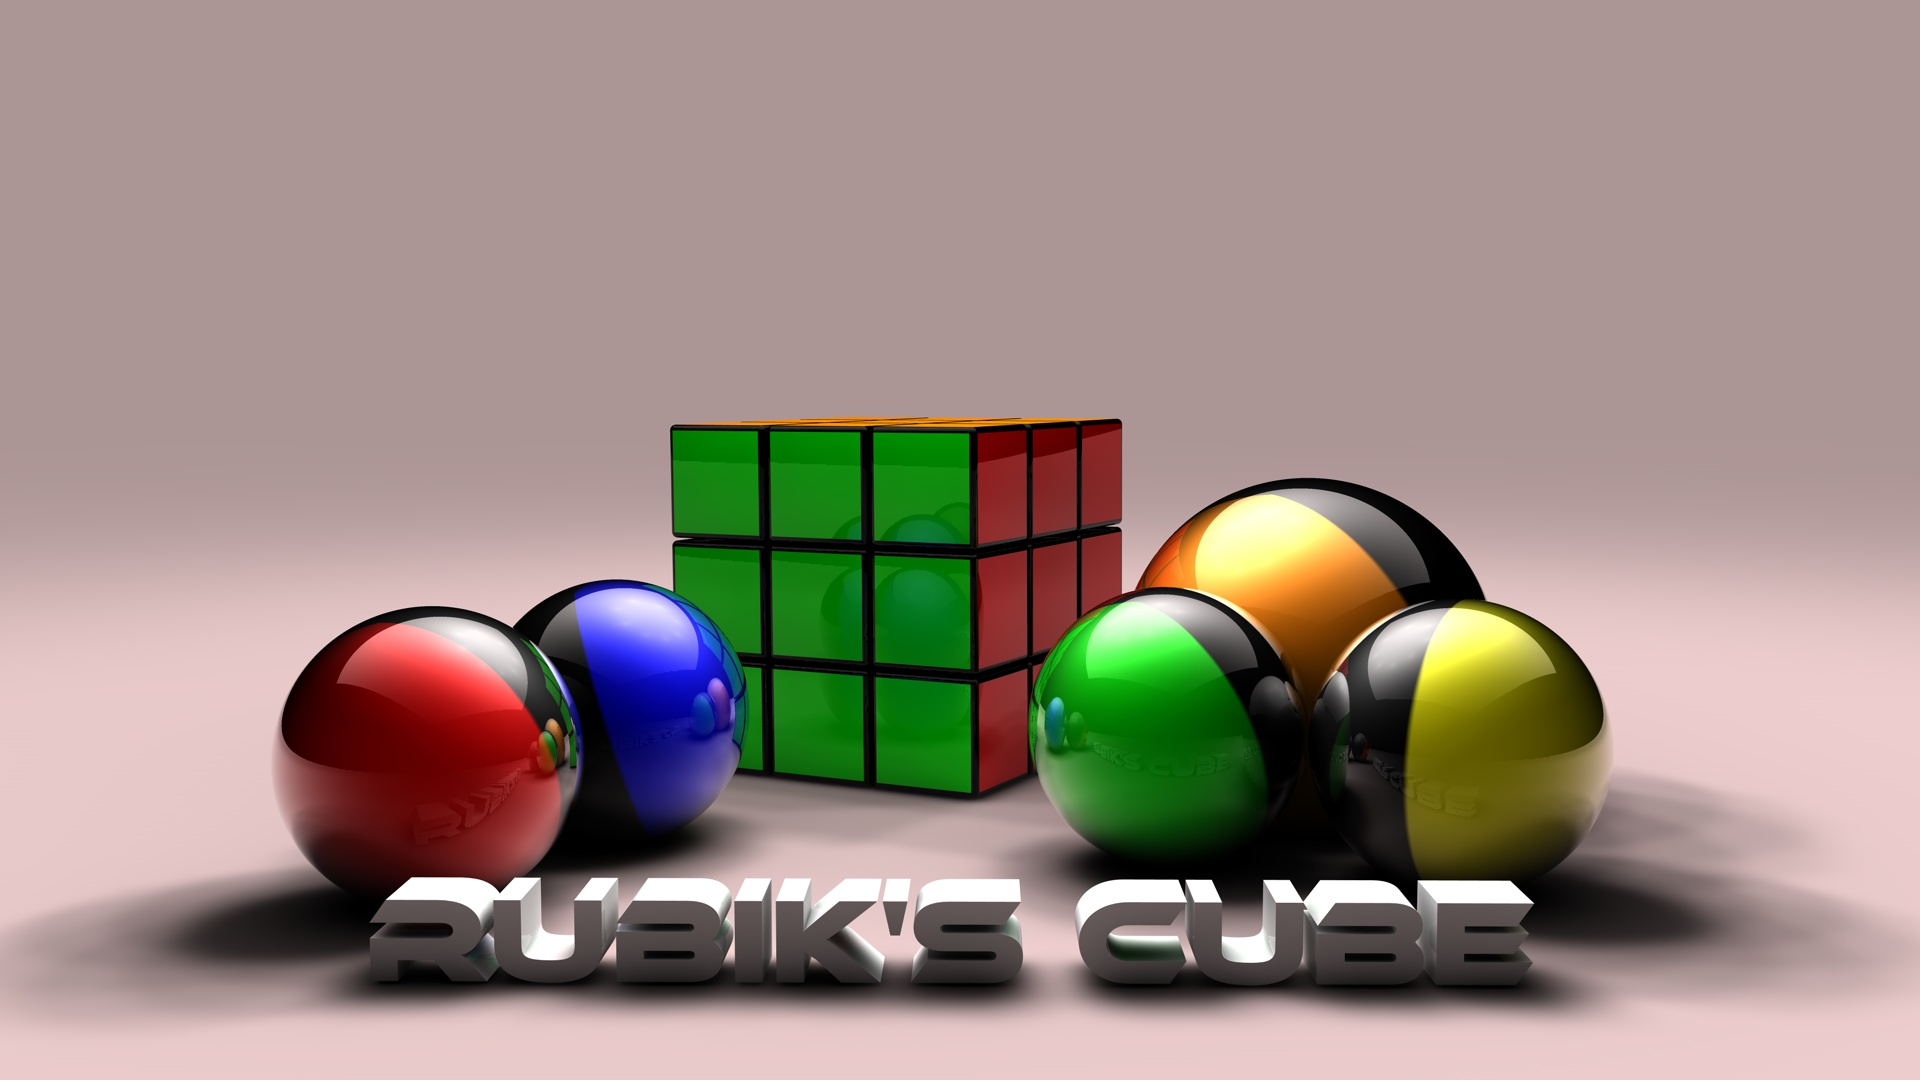 Rubiks Cube Wallpaper By Techflashdesigns On Deviantart